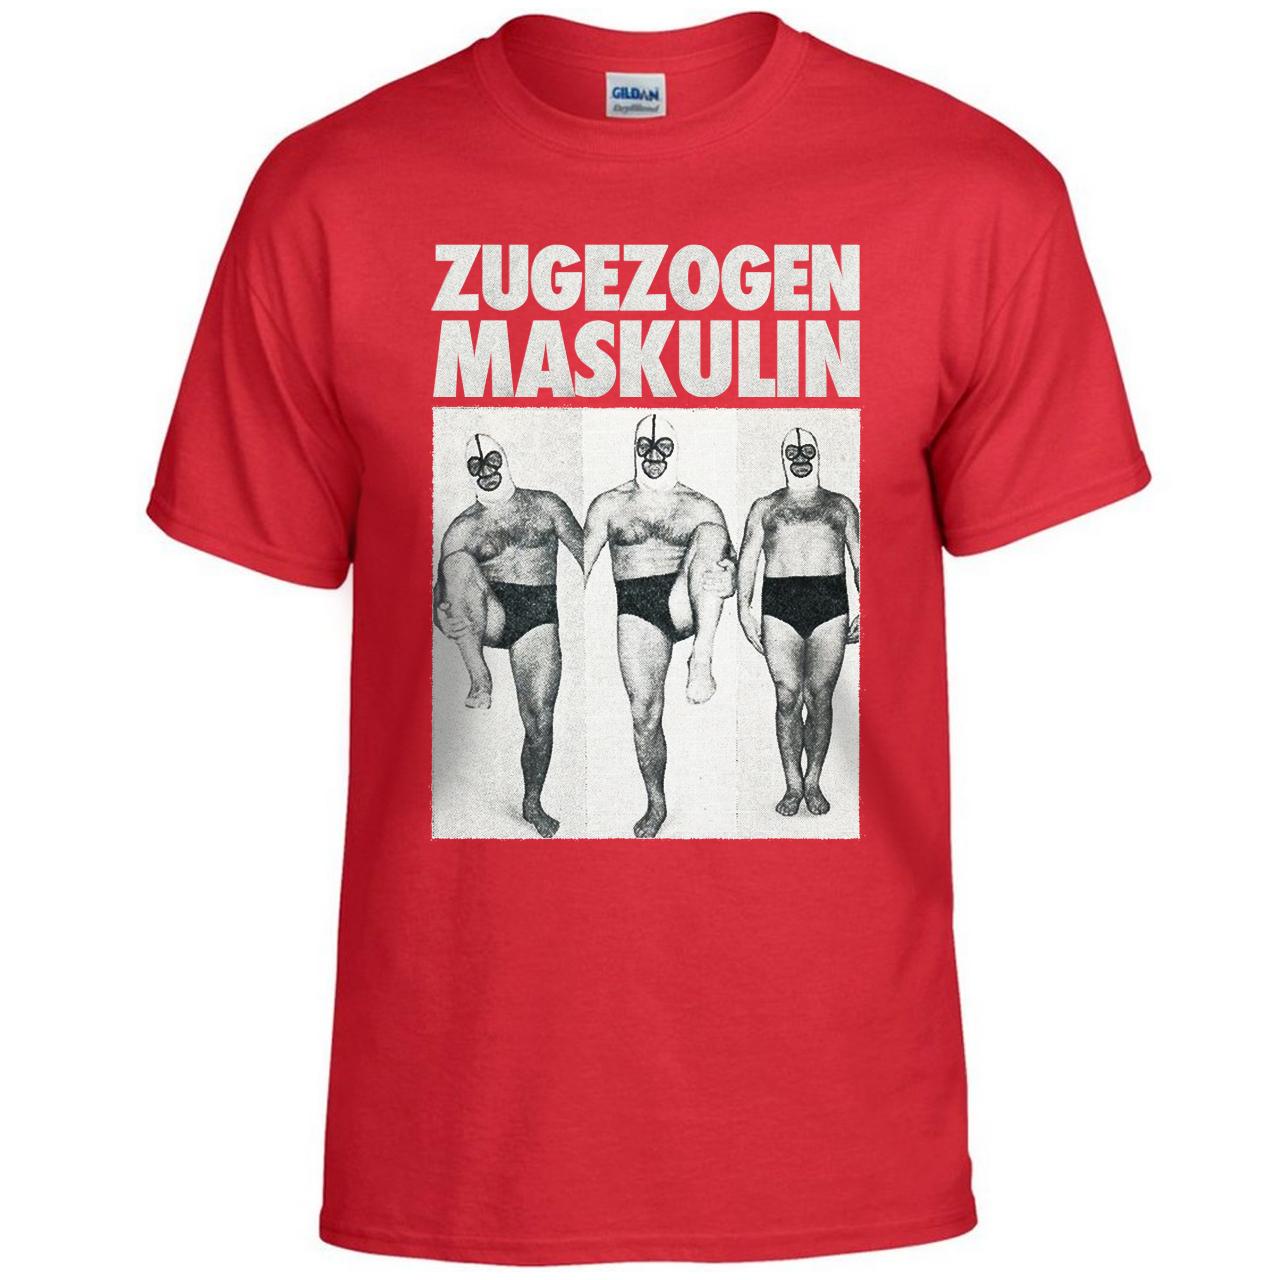 ZM Aggro Wrestler / PREORDER BIS 27.11. T-Shirt Rot